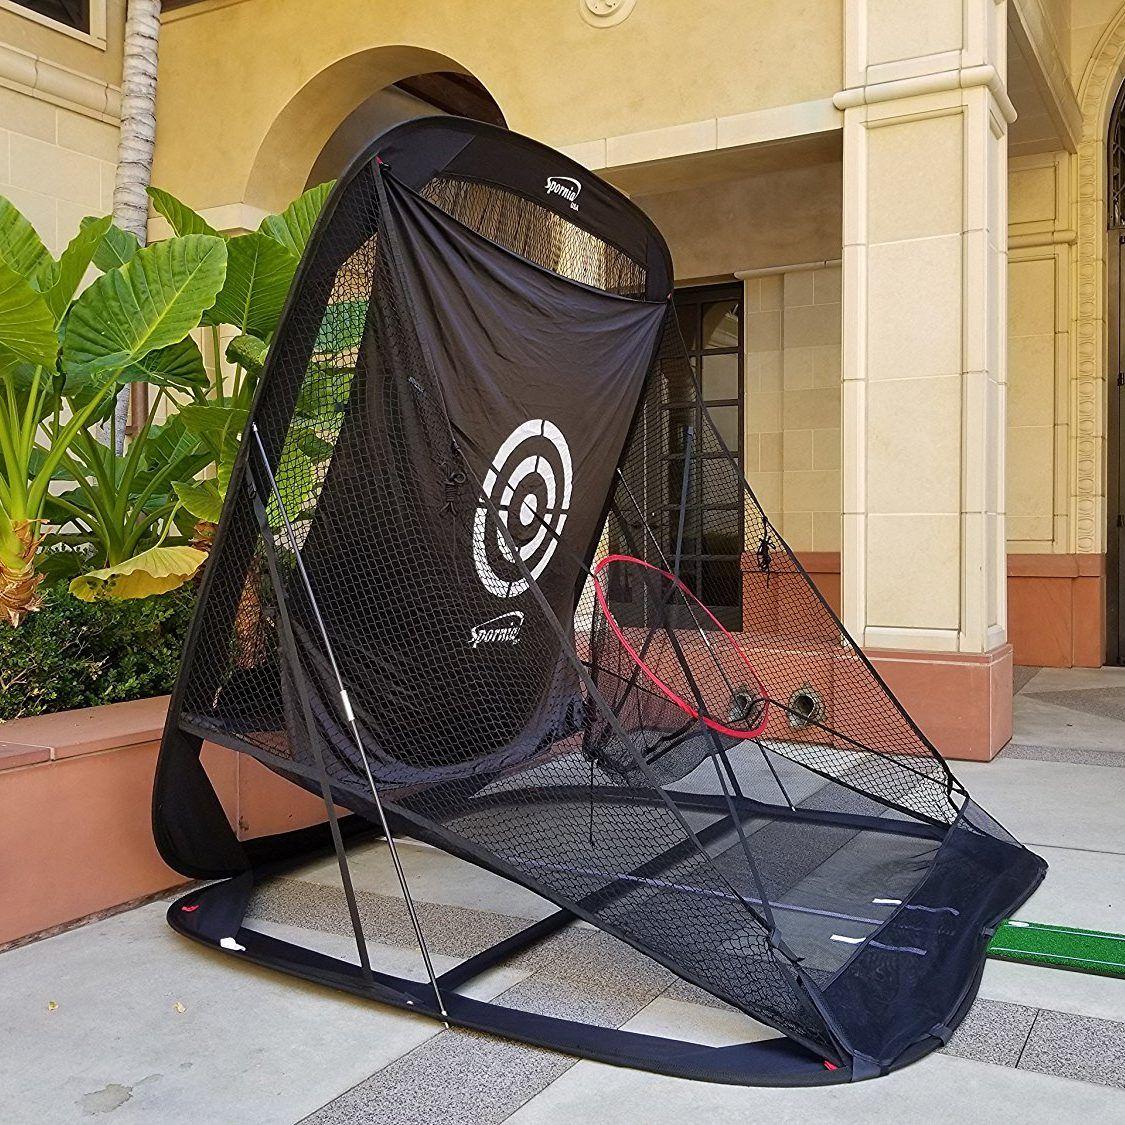 Spornia Net Full chipping basket